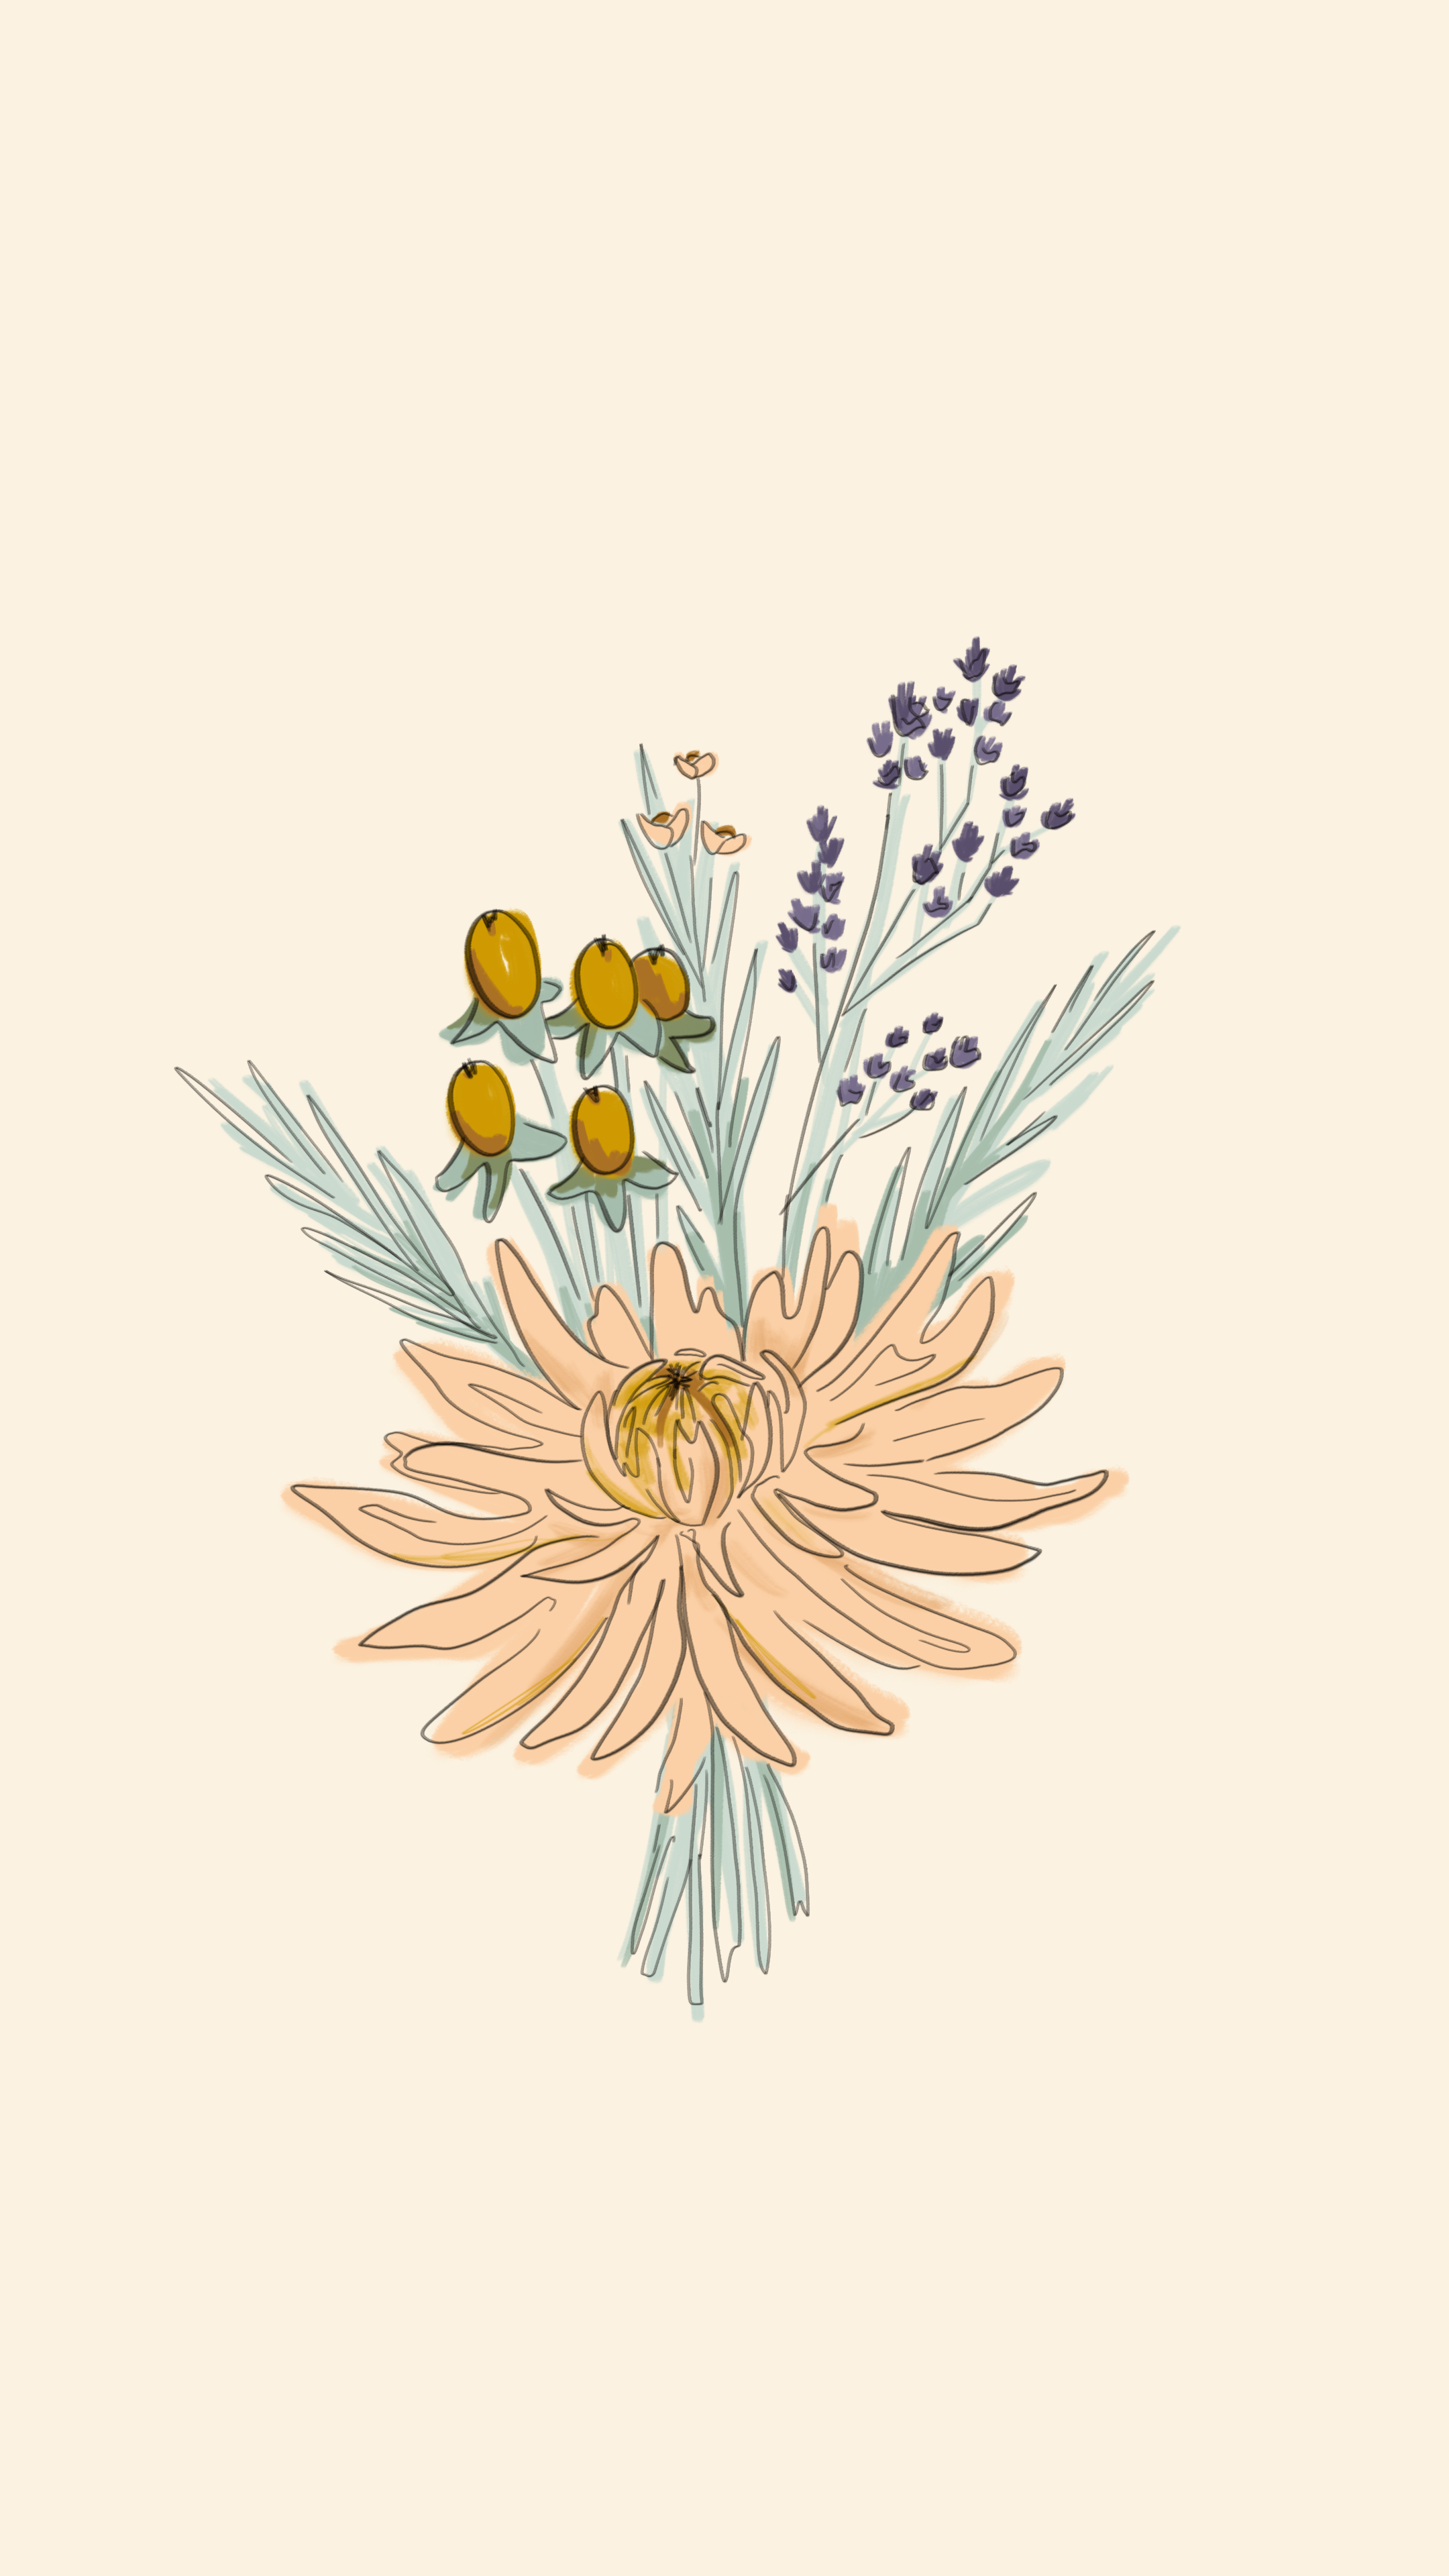 La Mia May Flowers Cute Patterns Wallpaper Cute Wallpapers For Ipad Art Wallpaper